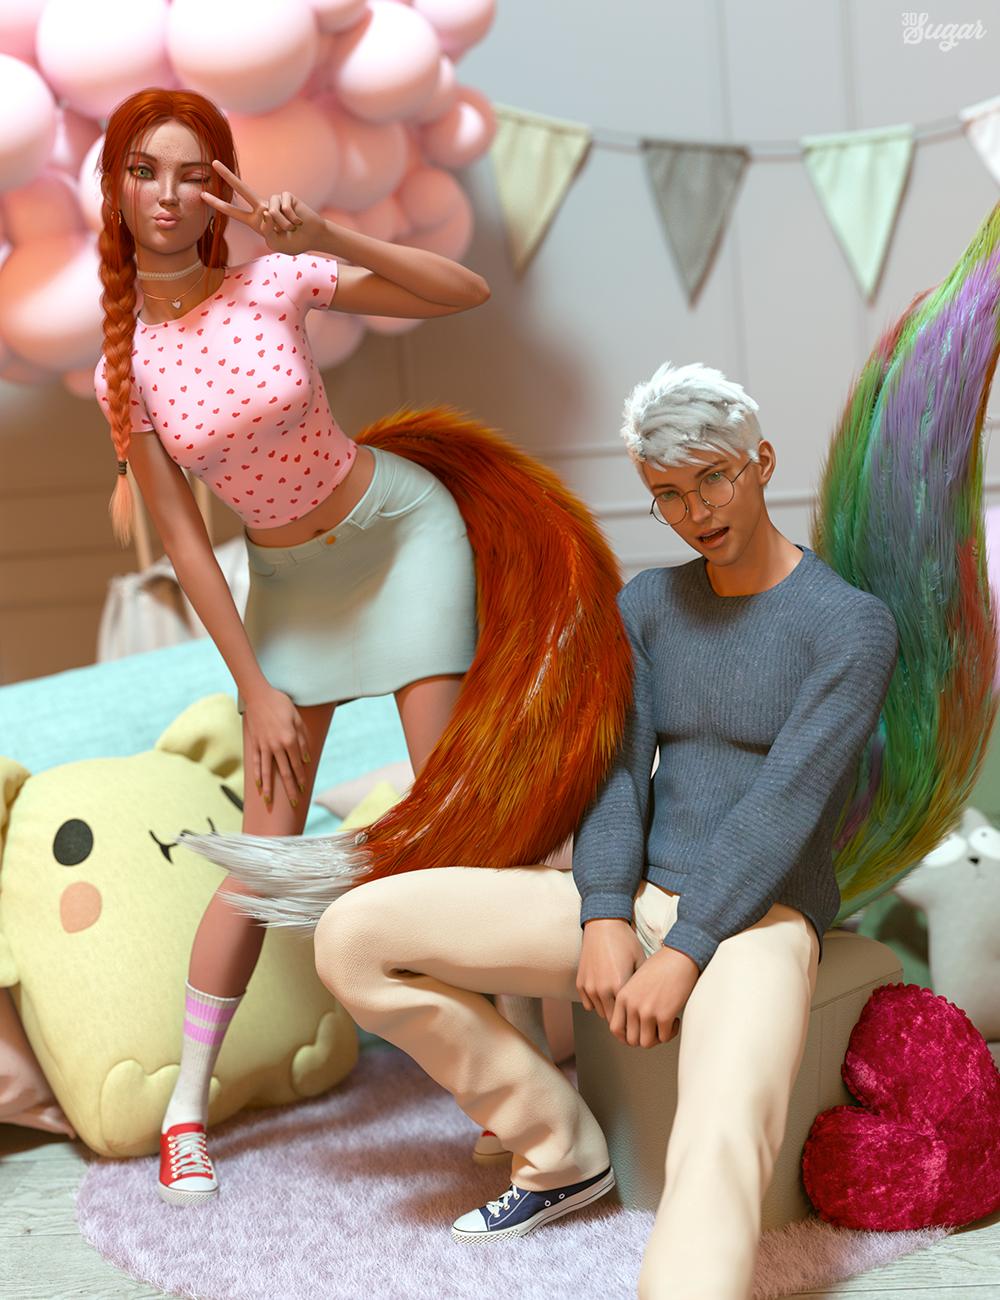 Kawaii Mood Poses and Expressions for Kiko 8.1 and Kota 8.1 by: 3D Sugar, 3D Models by Daz 3D